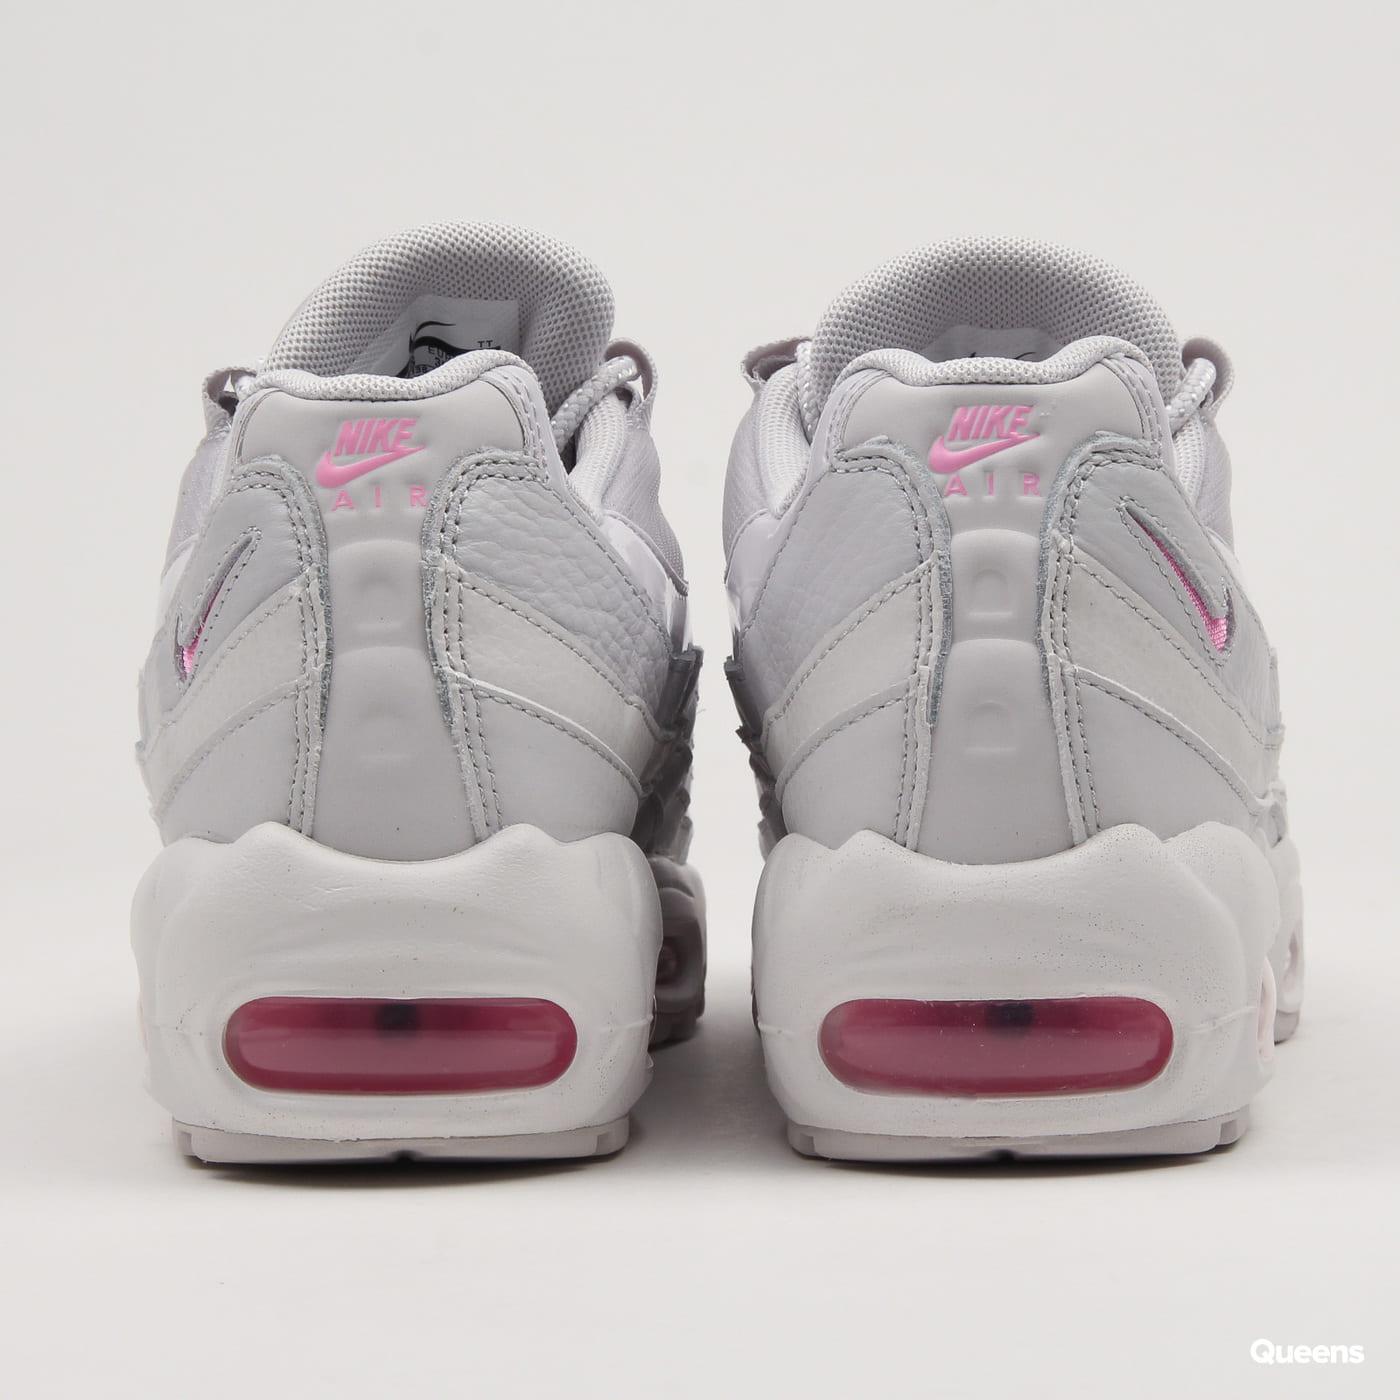 huge discount 5efa7 a5760 Zoom in Zoom in Zoom in Zoom in Zoom in. Nike WMNS Air Max 95 SE vast grey    psychic pink